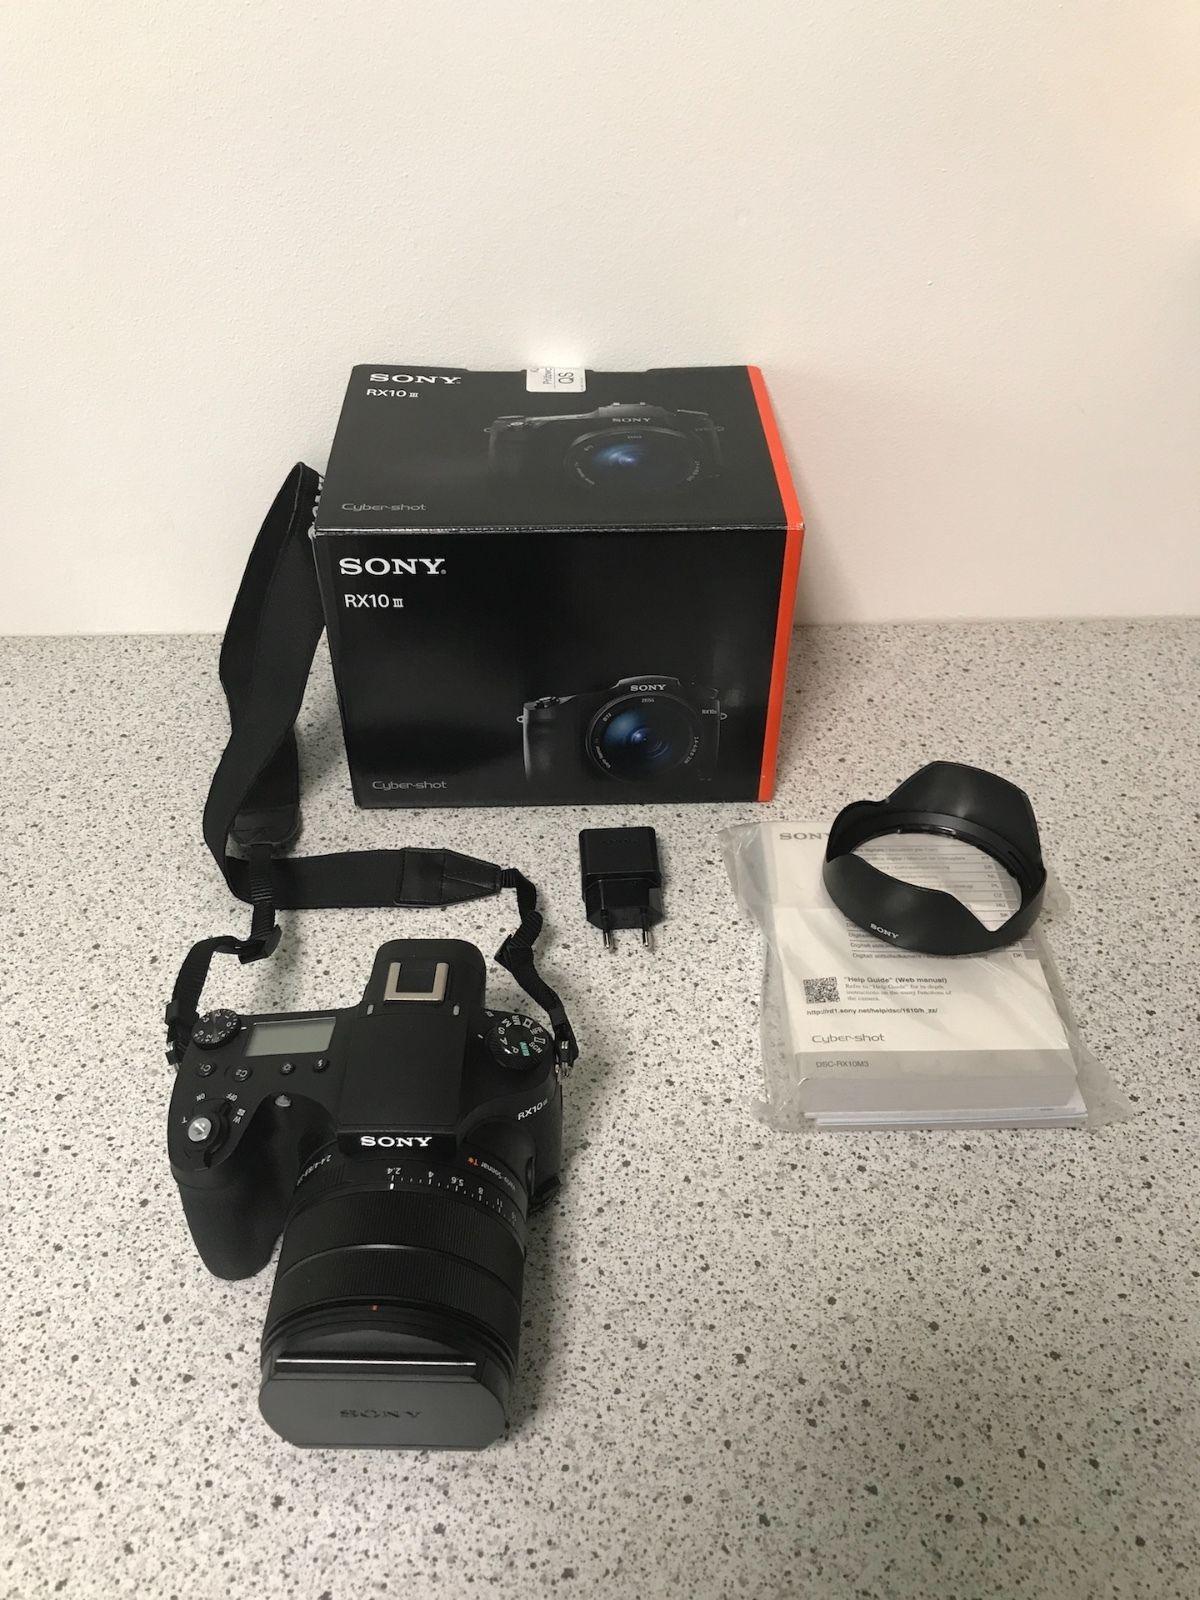 Sony DSC-RX10 III * Zeiss 24-600mm Objektiv * Bridgekamera * 4K * Wie Neu